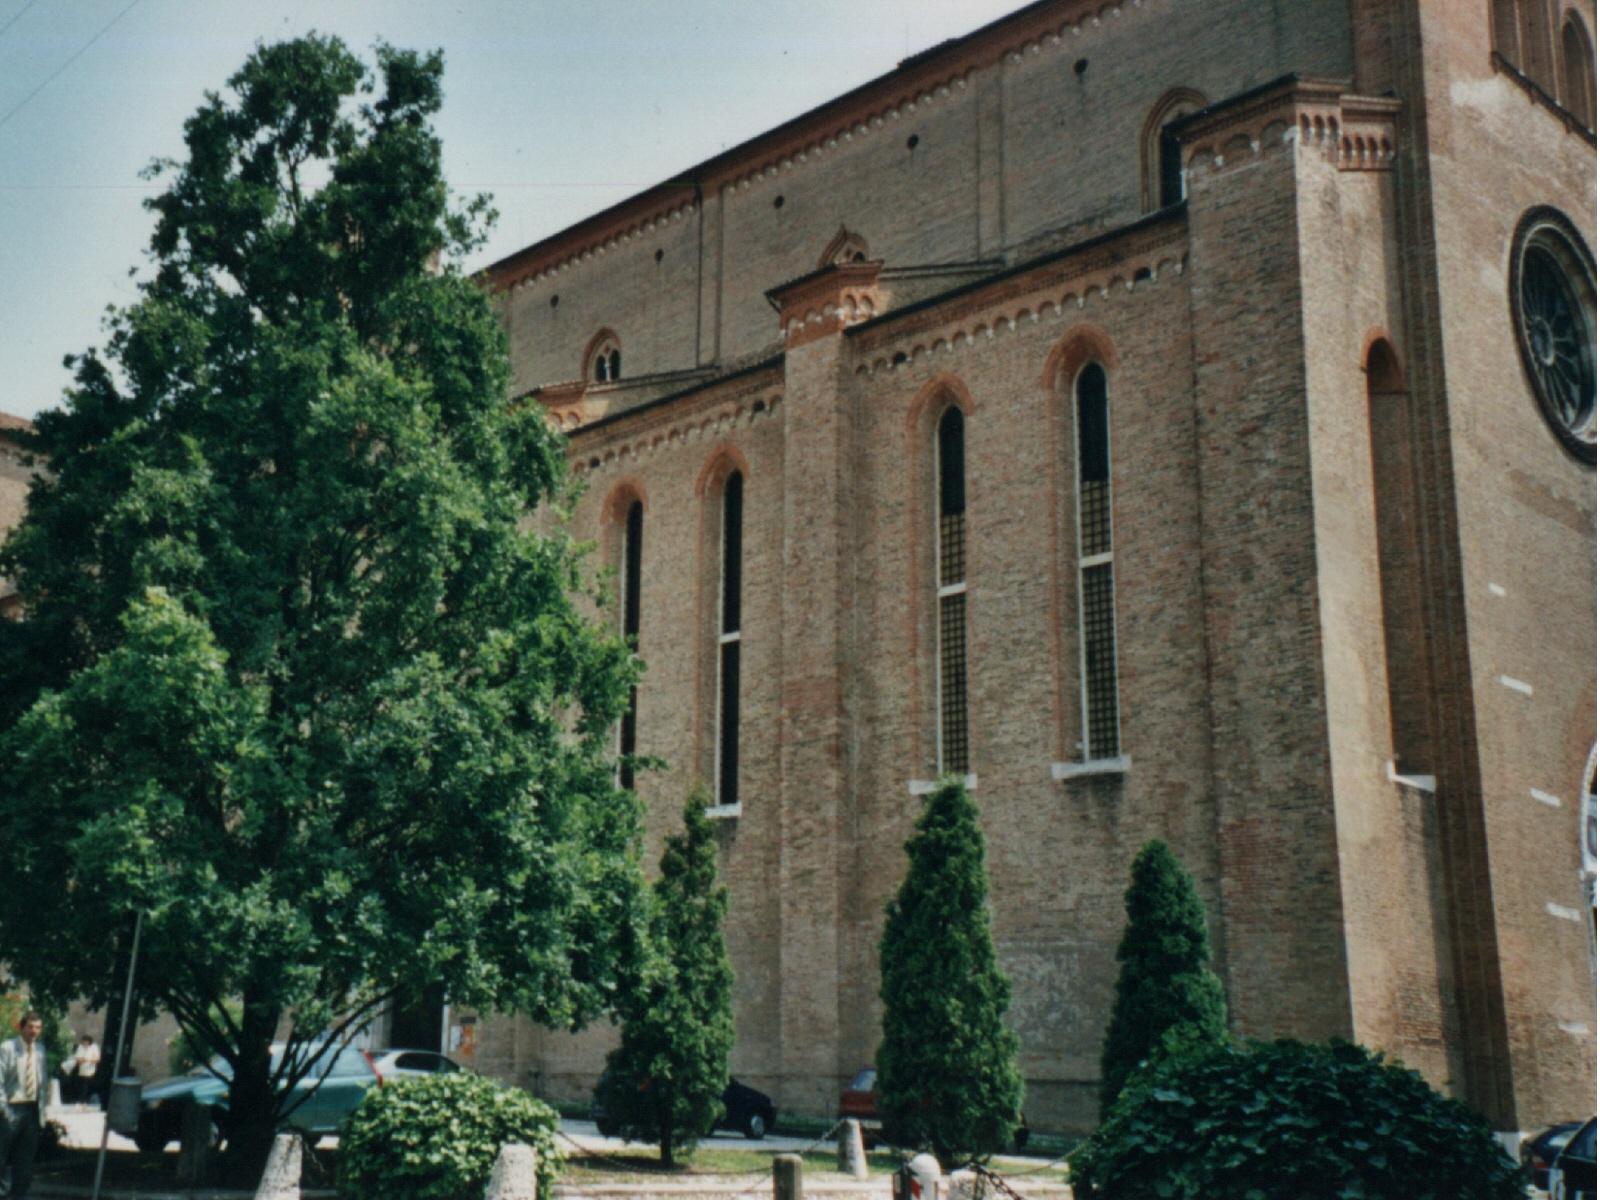 Kirche San Nicolo in Treviso